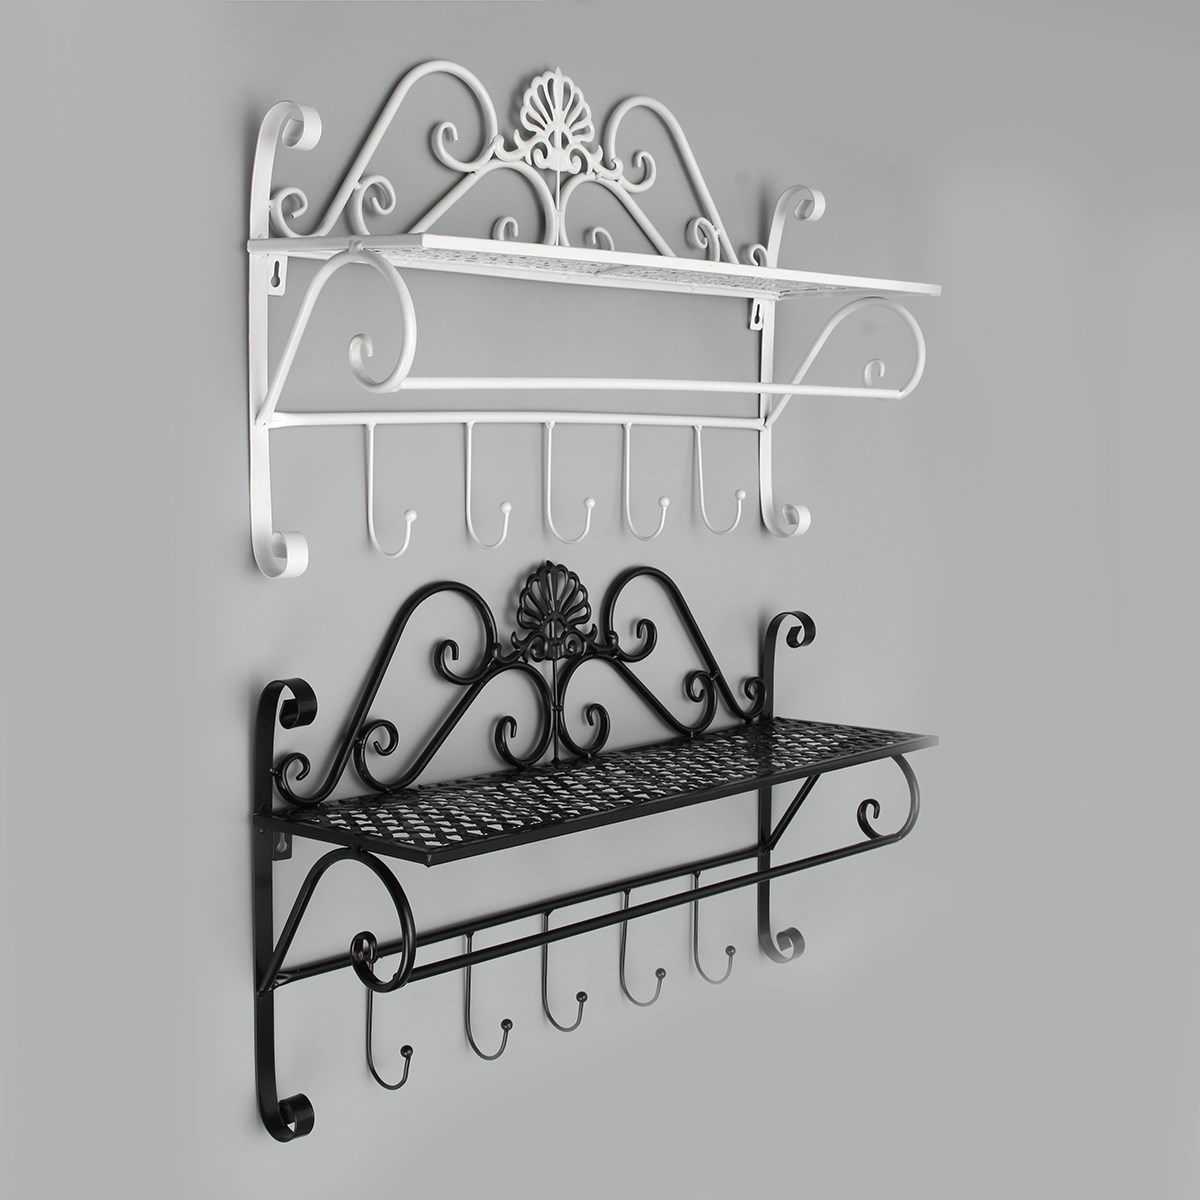 Wrought Iron Bathroom Wall Towel Shelf: Online Buy Wholesale Wrought Iron Bathroom Shelves From